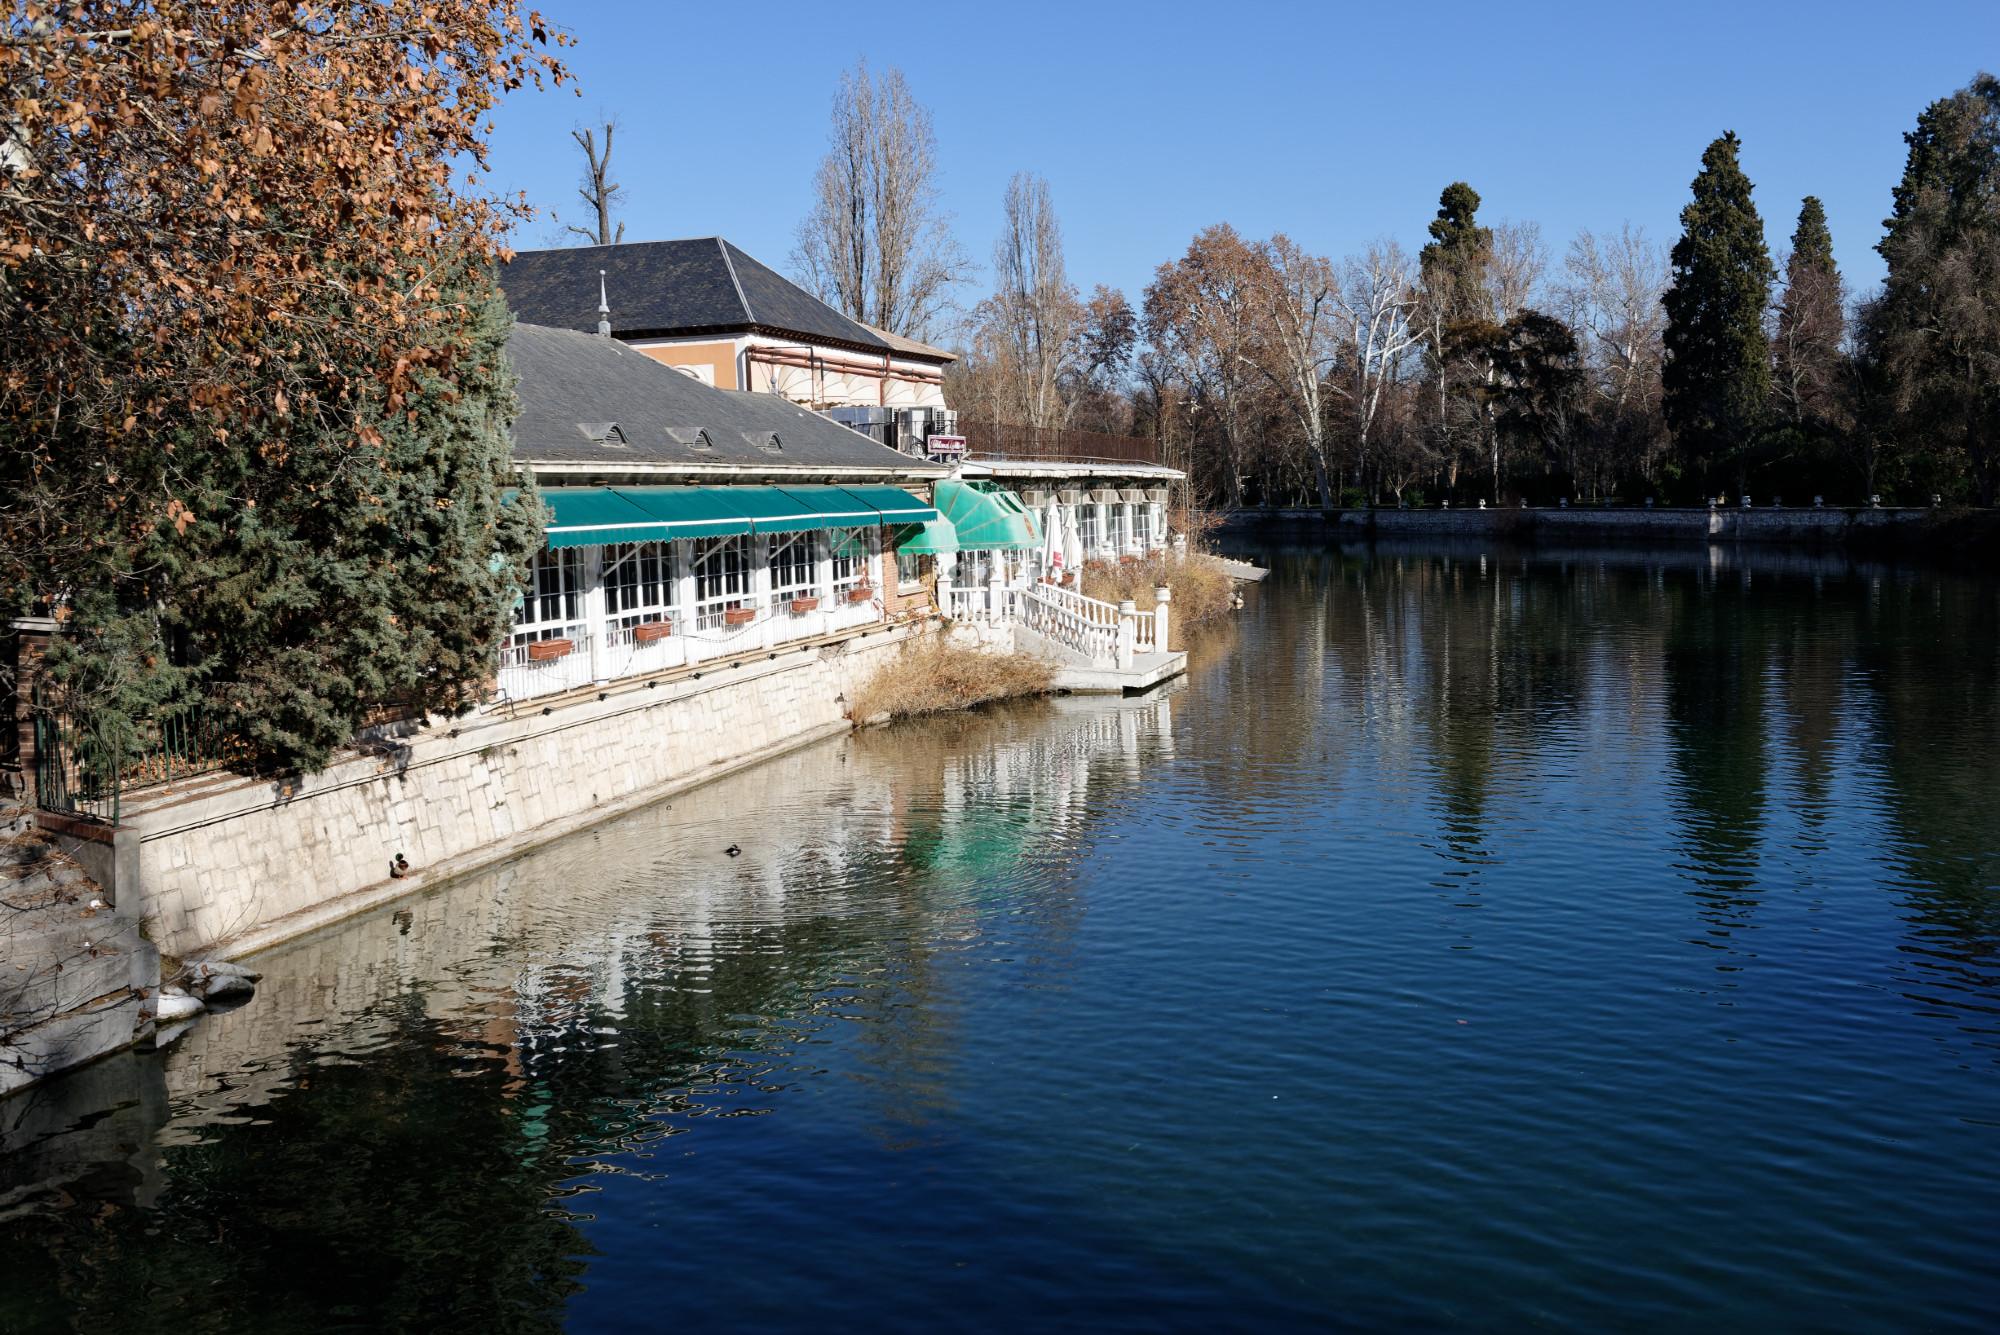 171221-Aranjuez (Castille) (11)